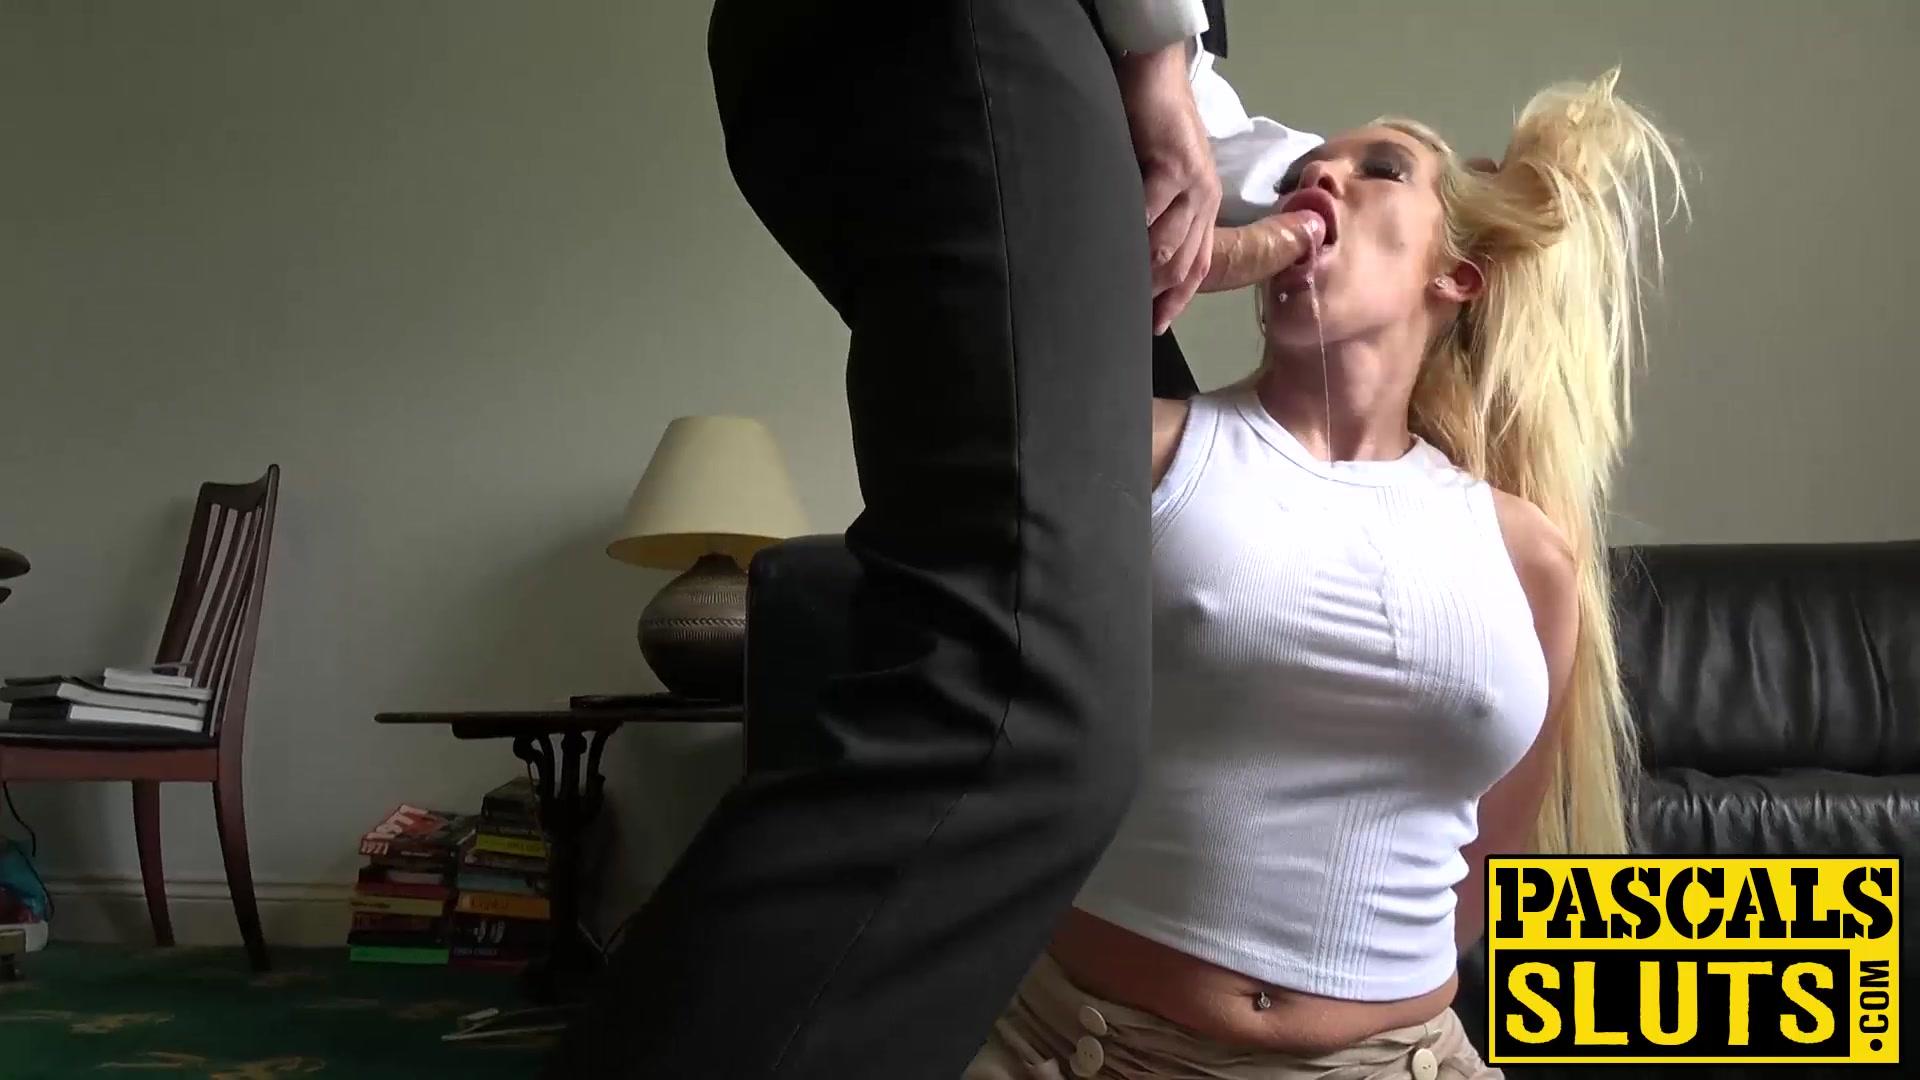 Porn pictures Odmhsas jobs